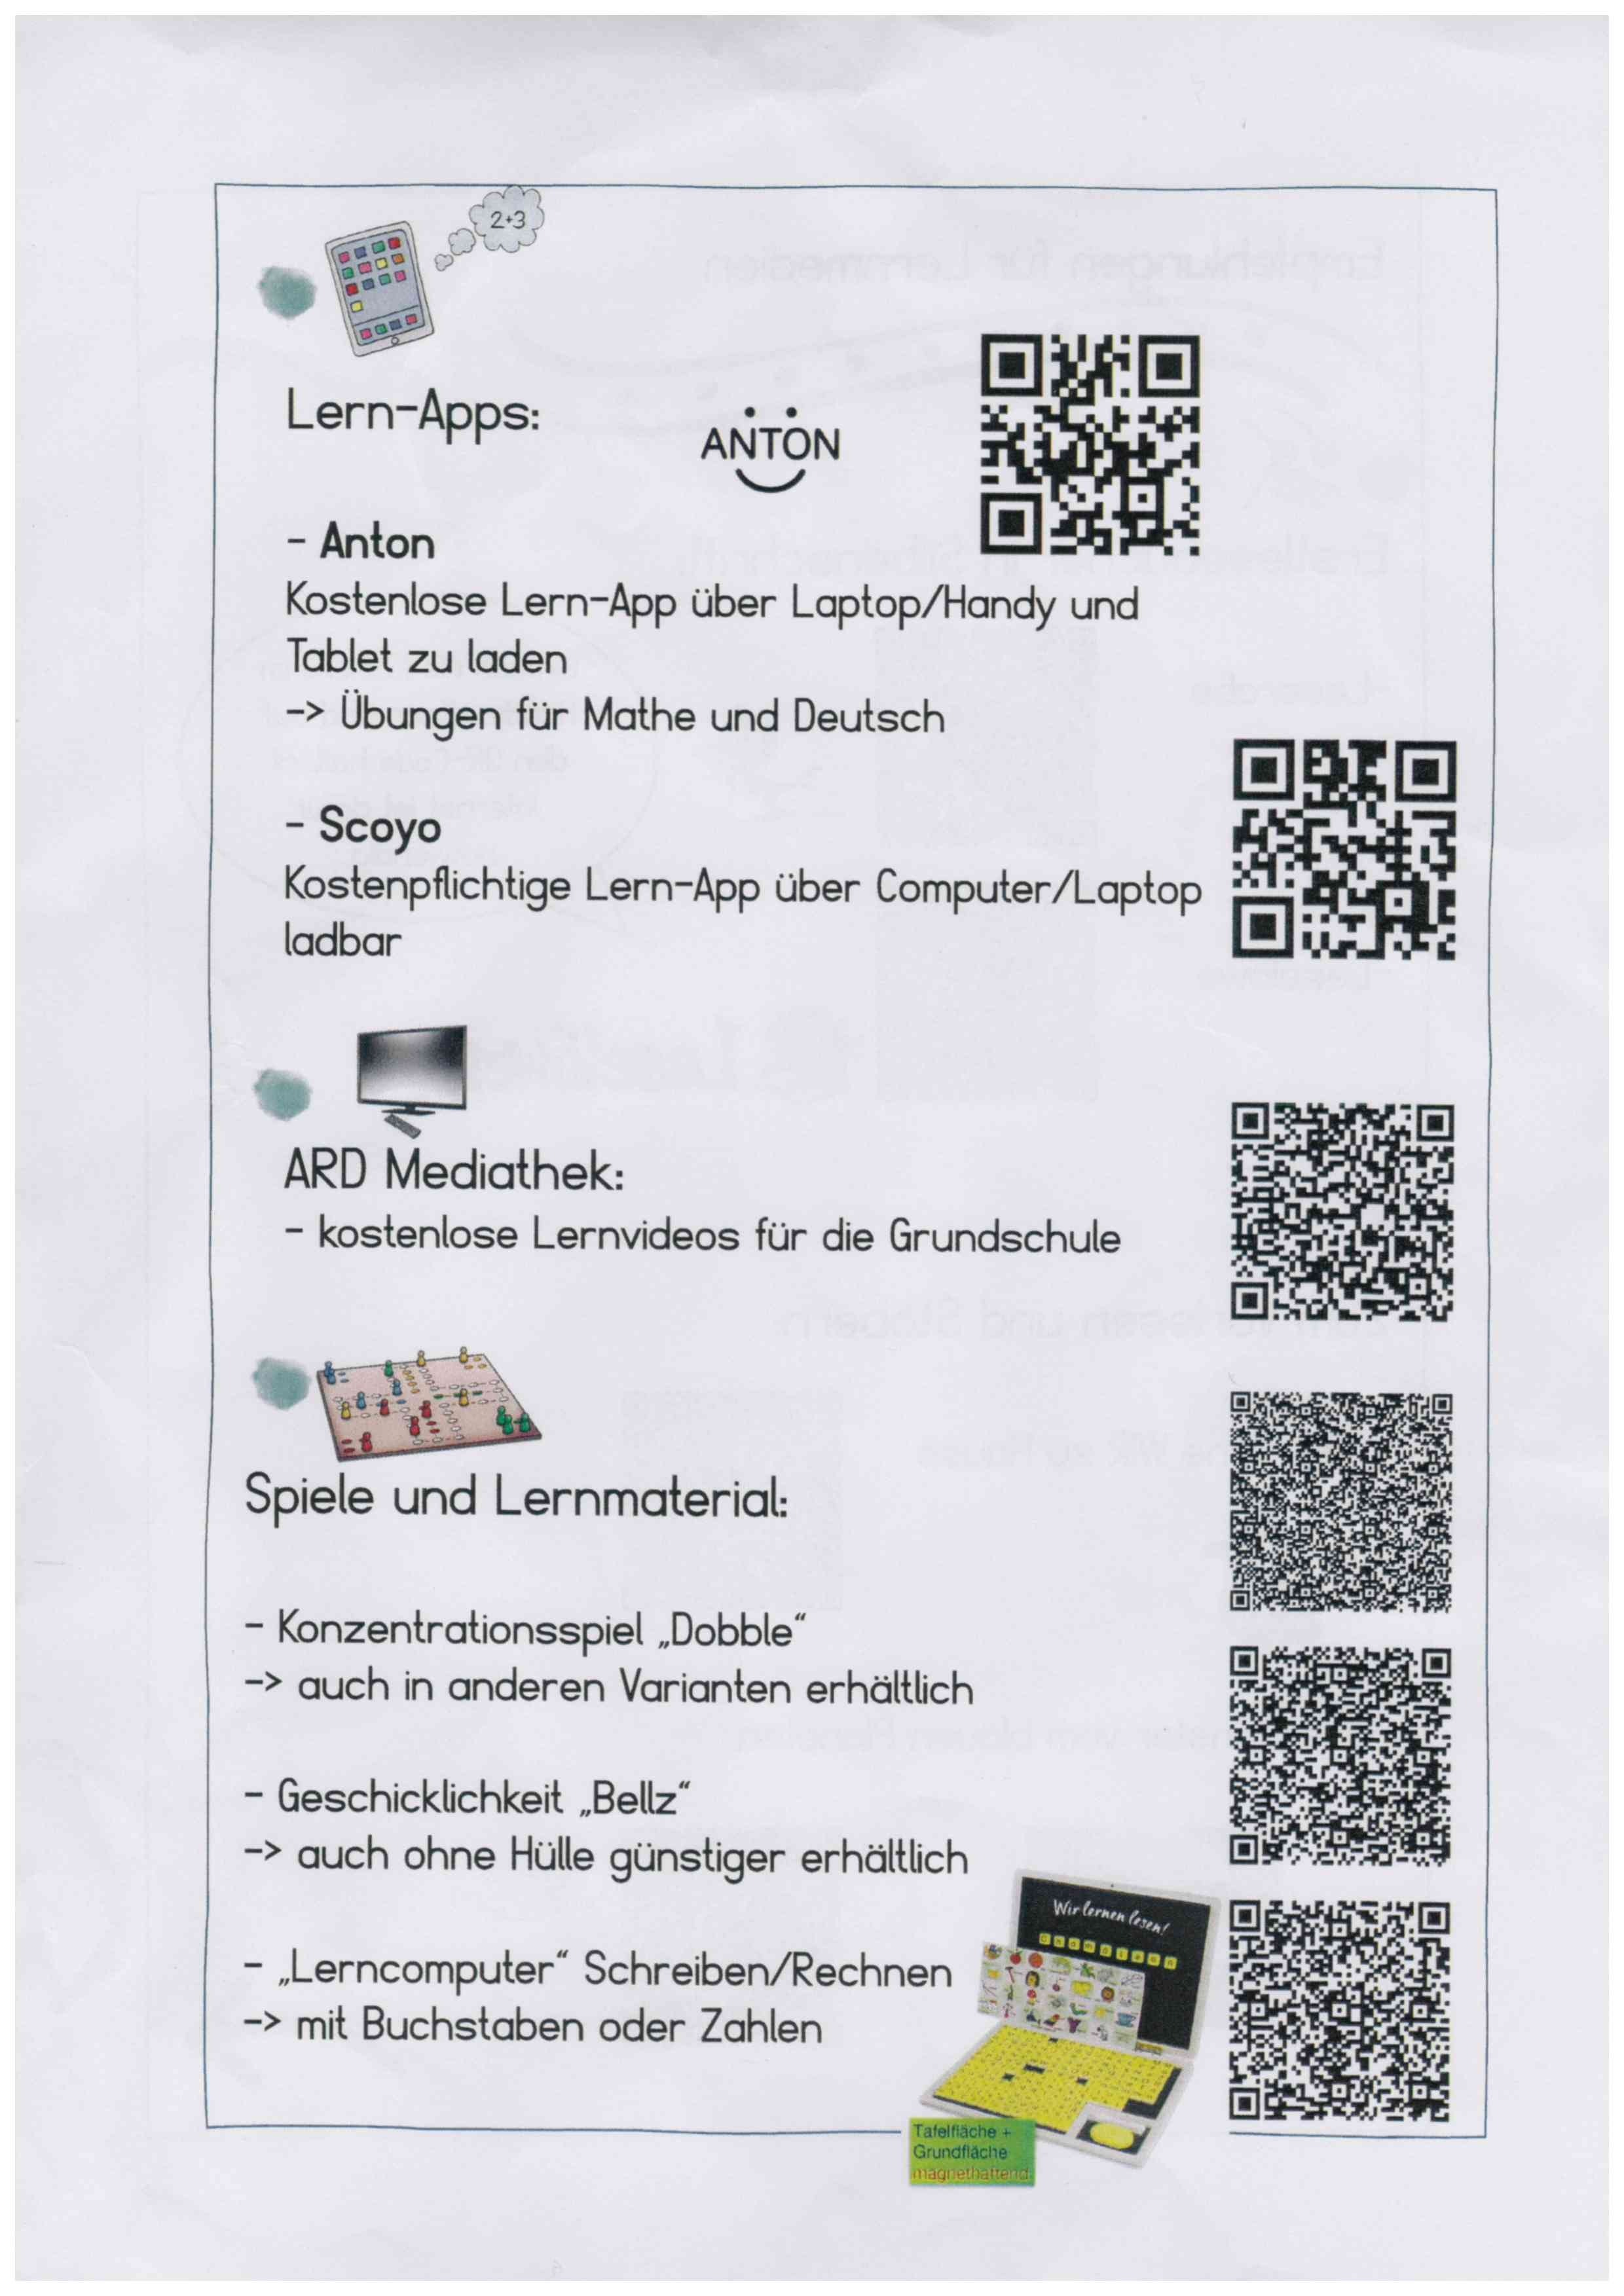 LernApps